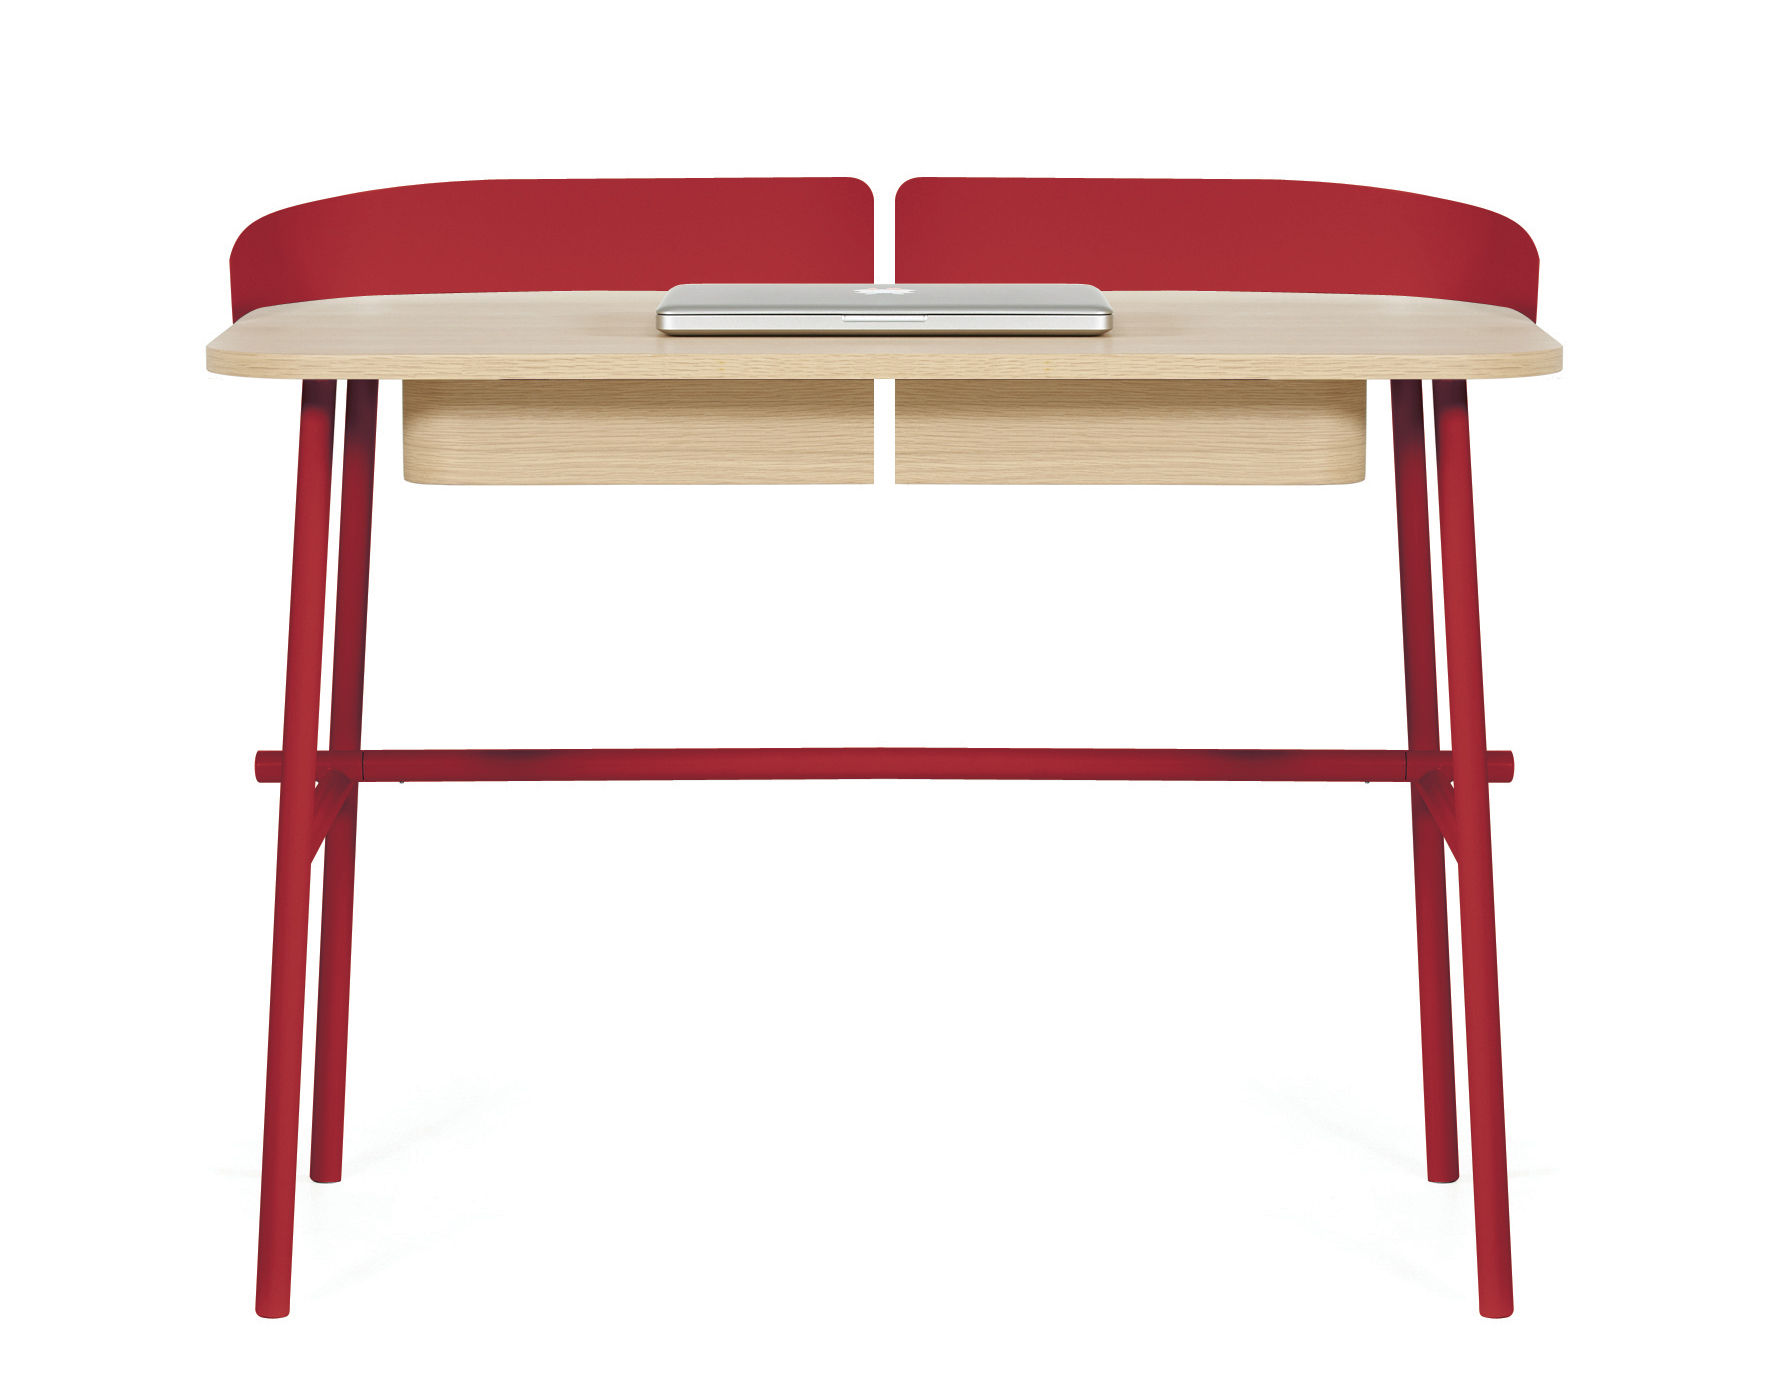 Bureau victor rouge cerise bois naturel hart for Bureau pro victo